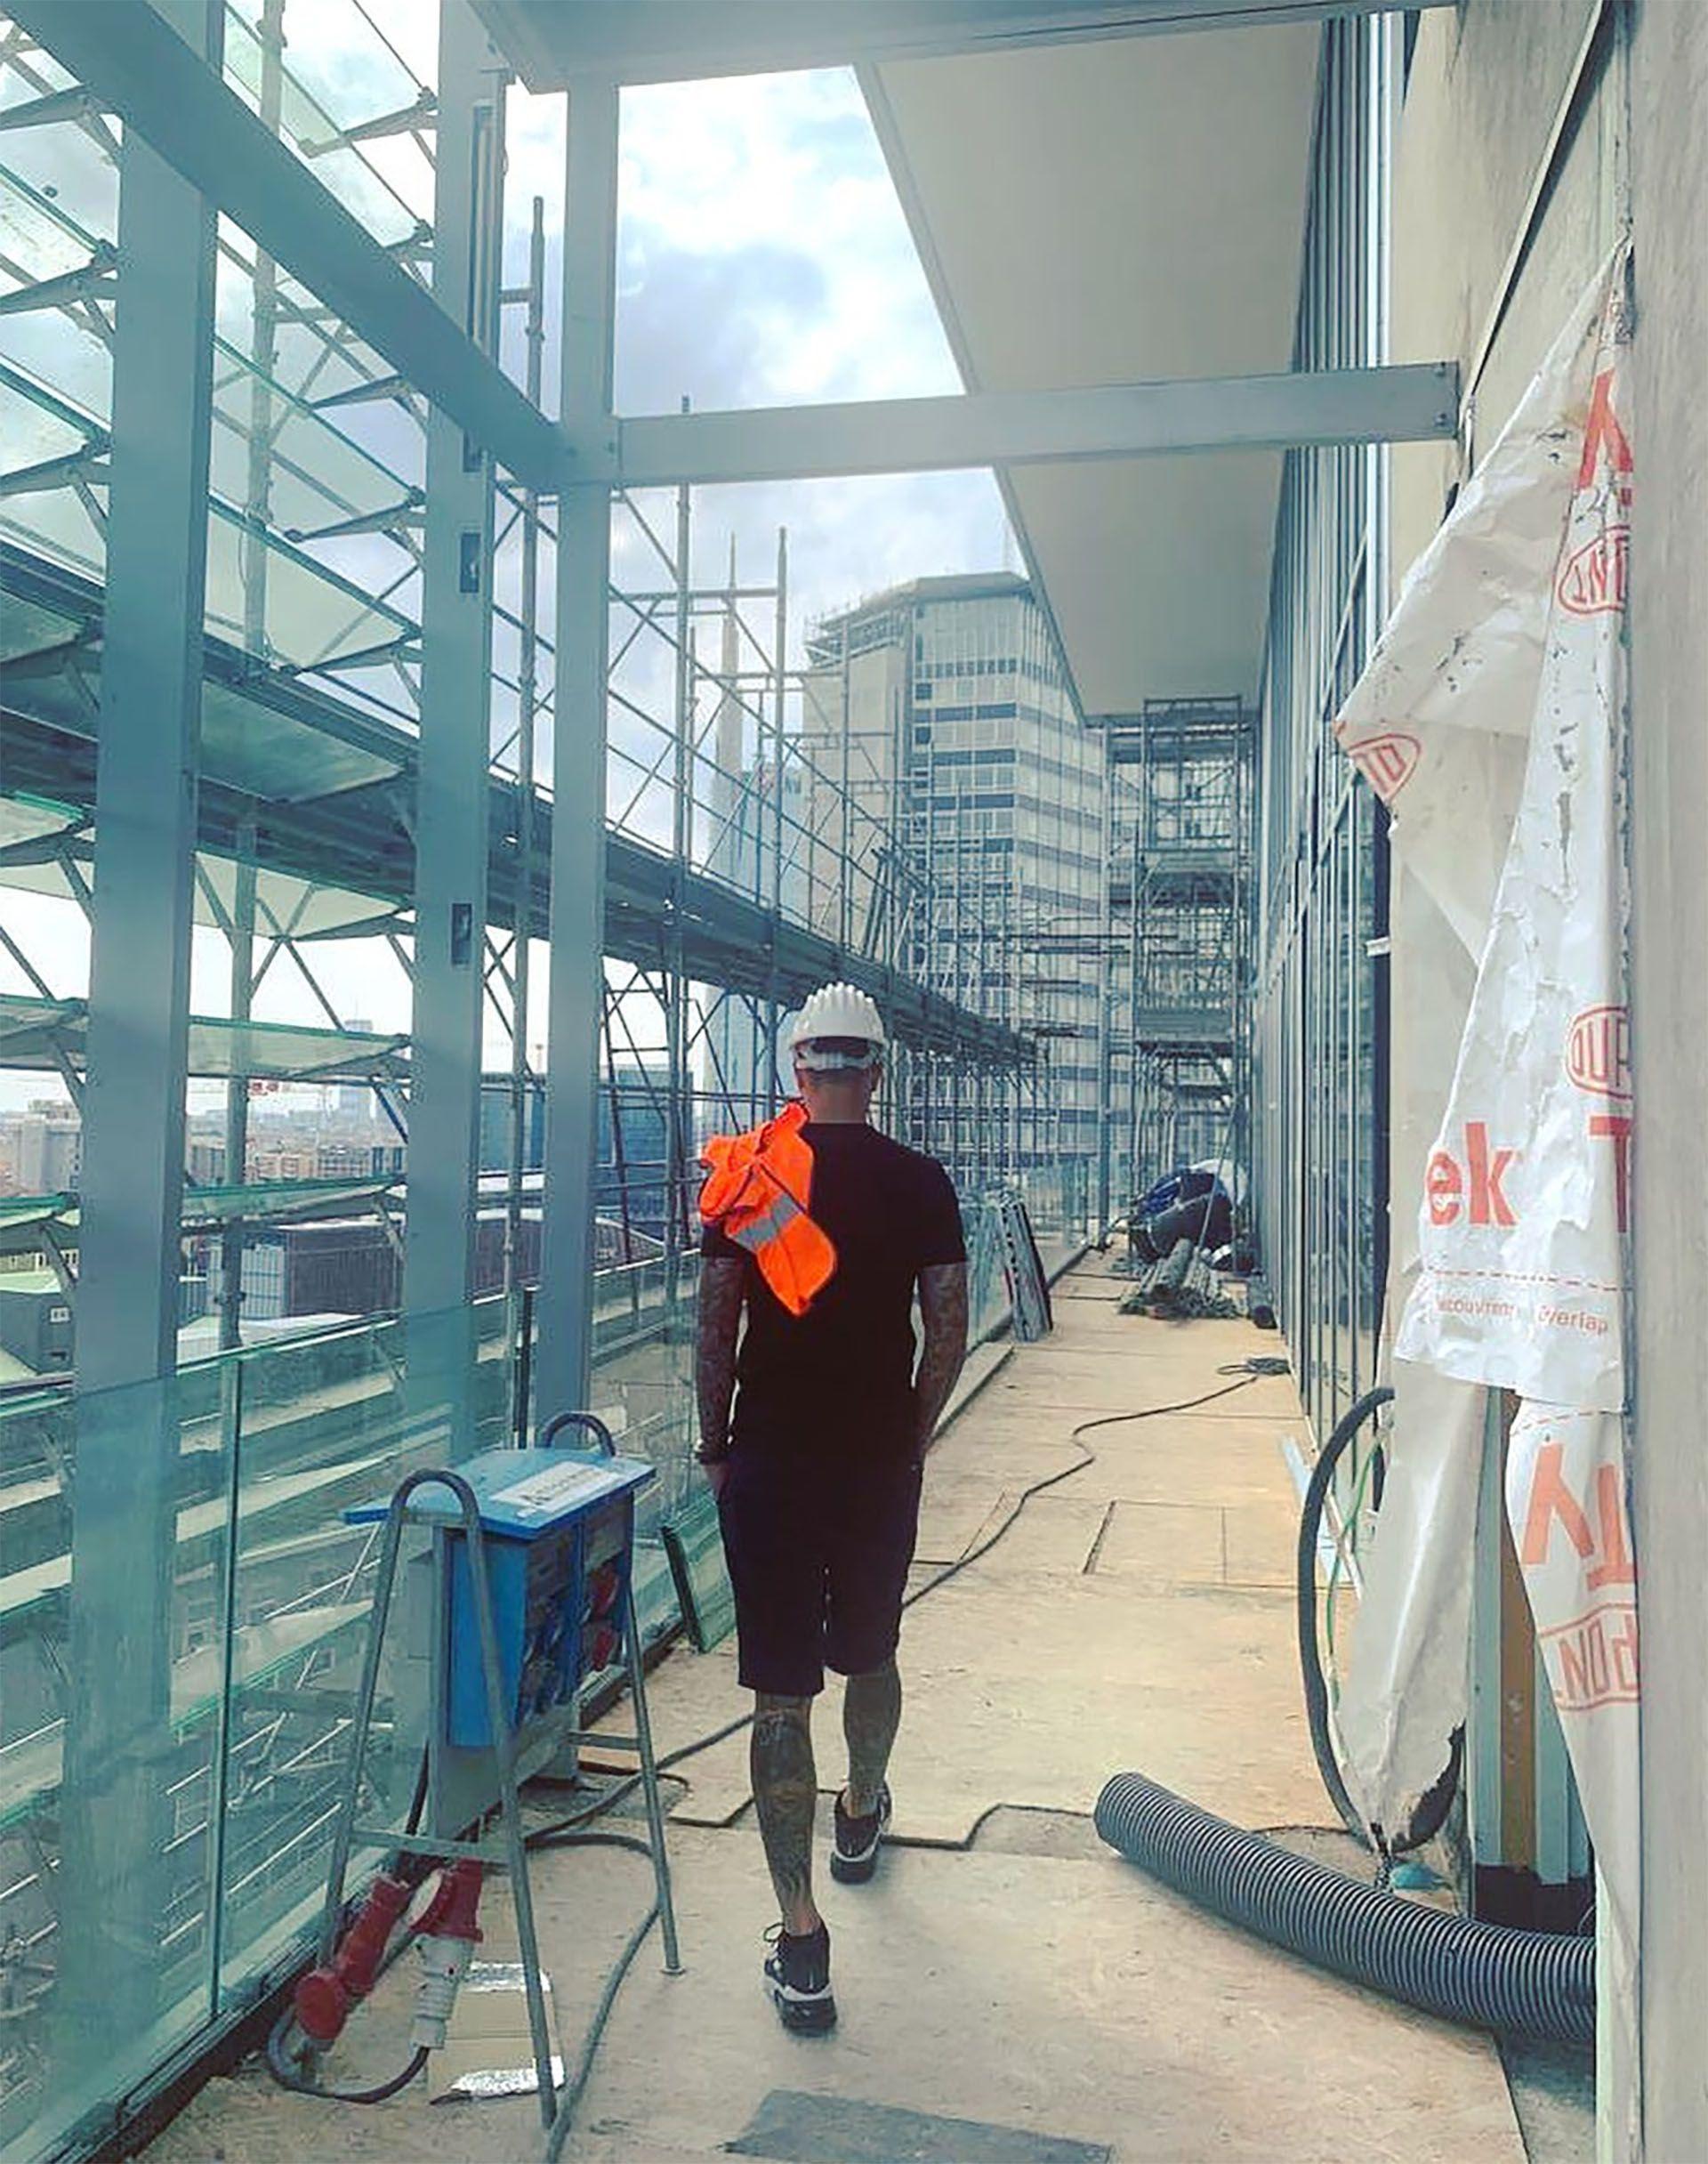 Mientras planea una mudanza, Icardi define su futuro laboral